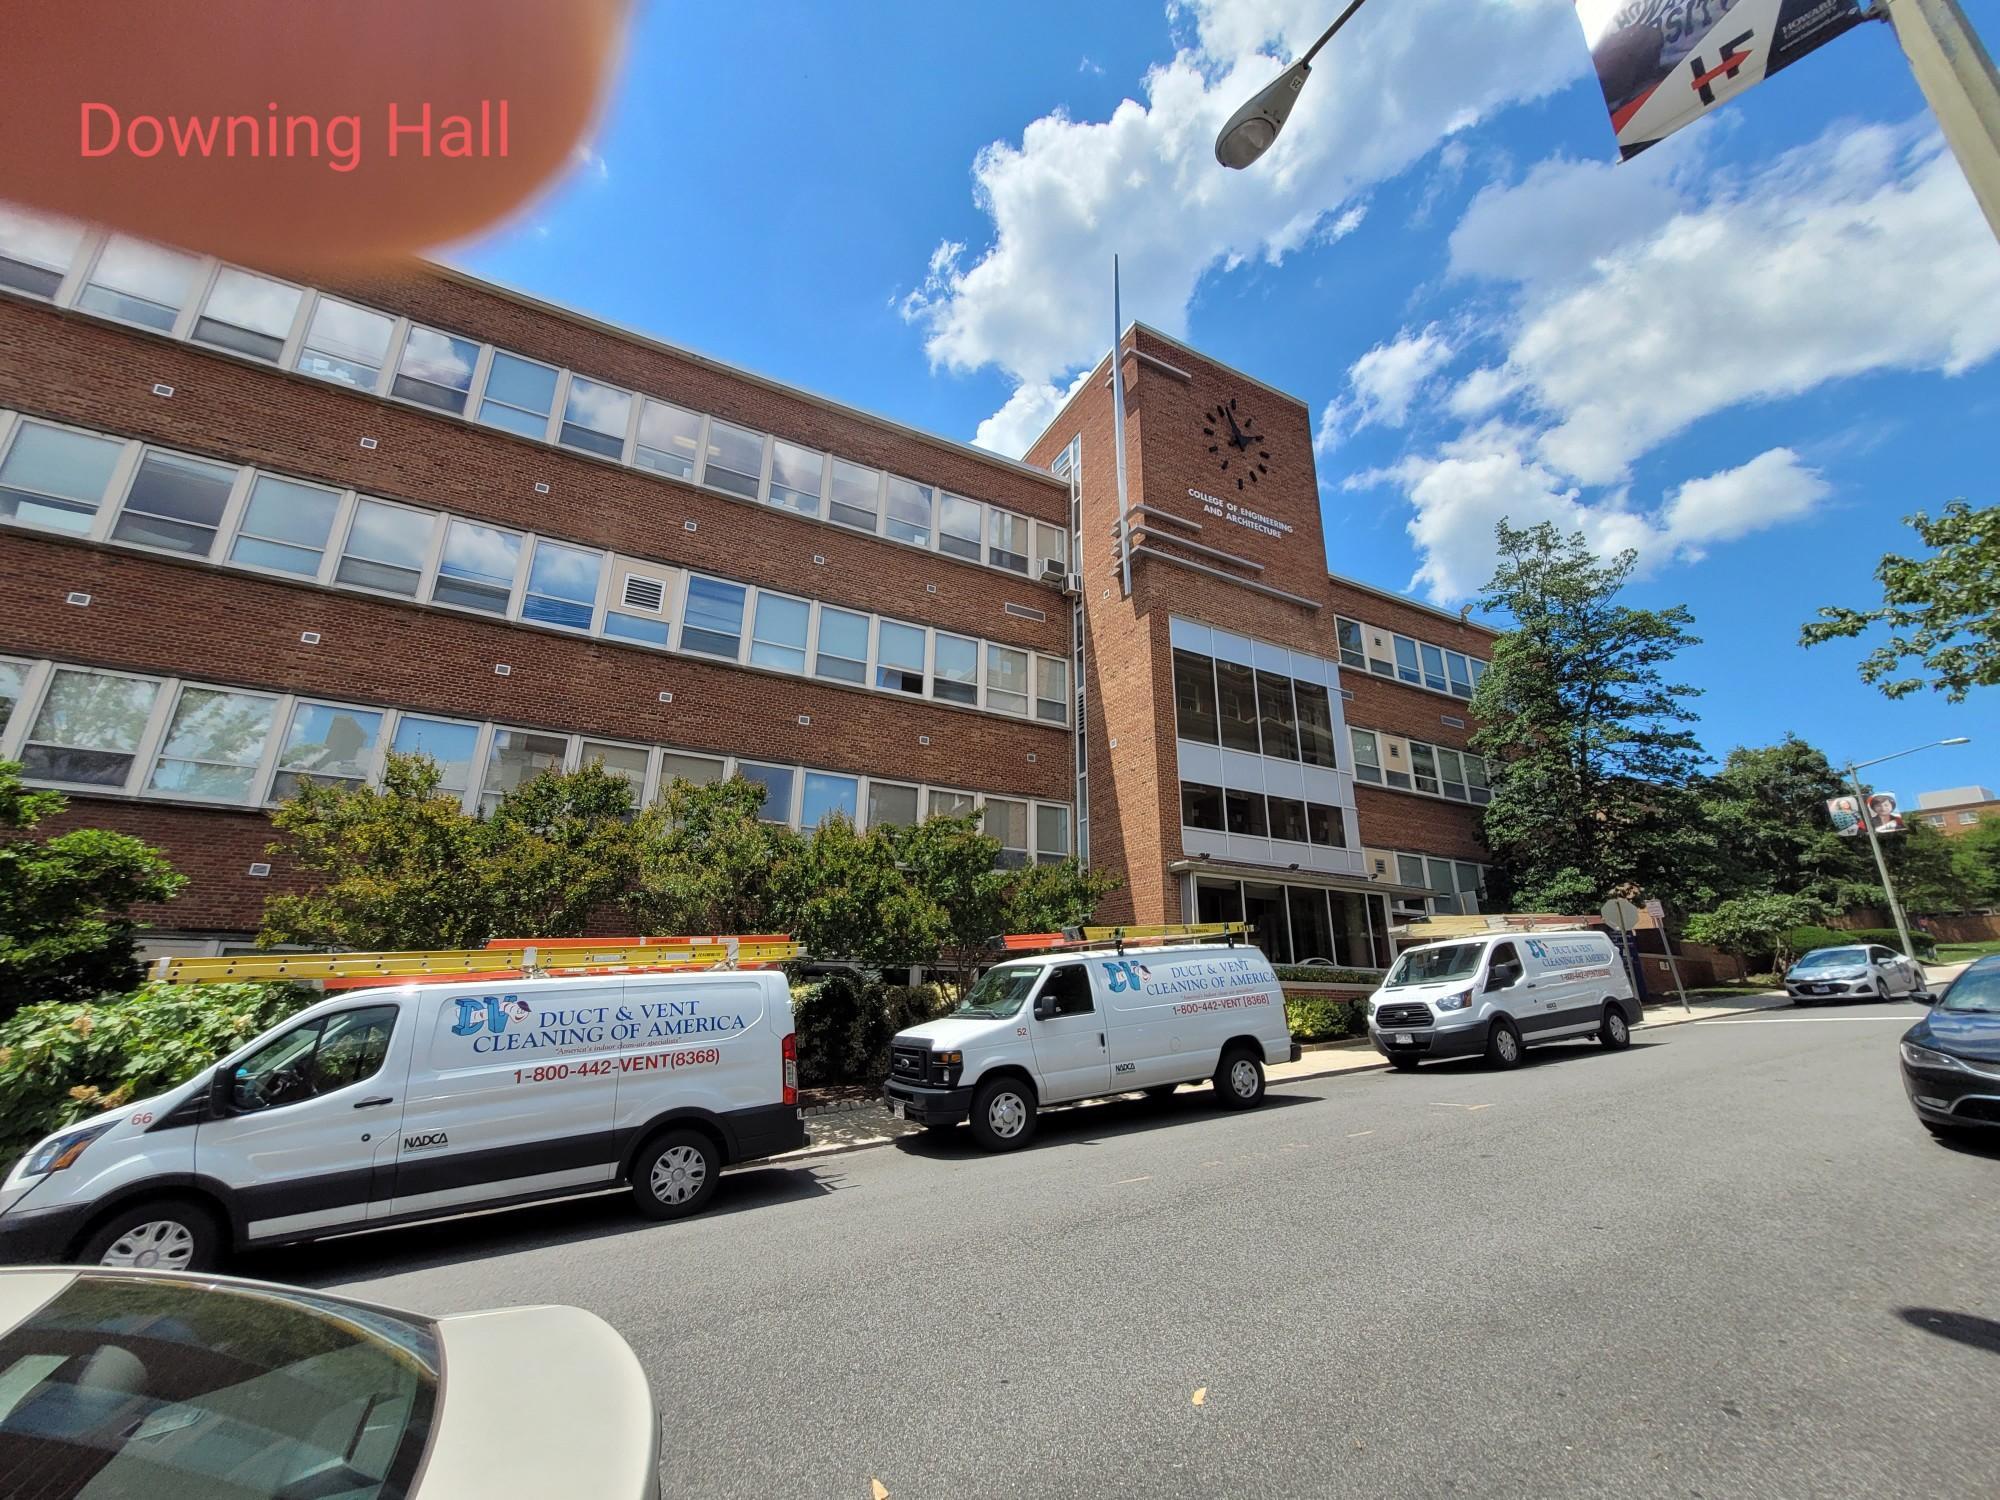 Howard University College of Engineering/Lewis K Downing Hall – Washington, DC image002.jpg